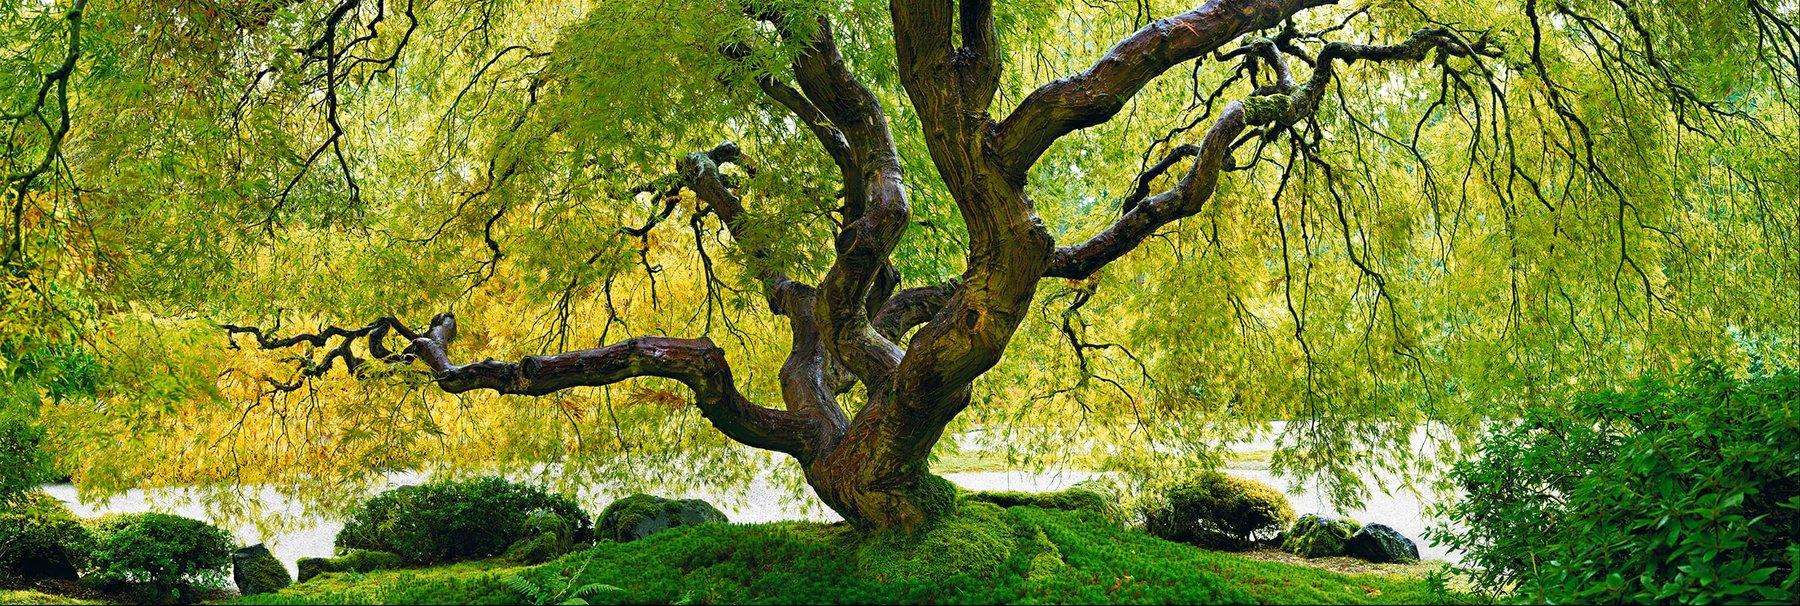 Peter Lik - Tree of Serenity